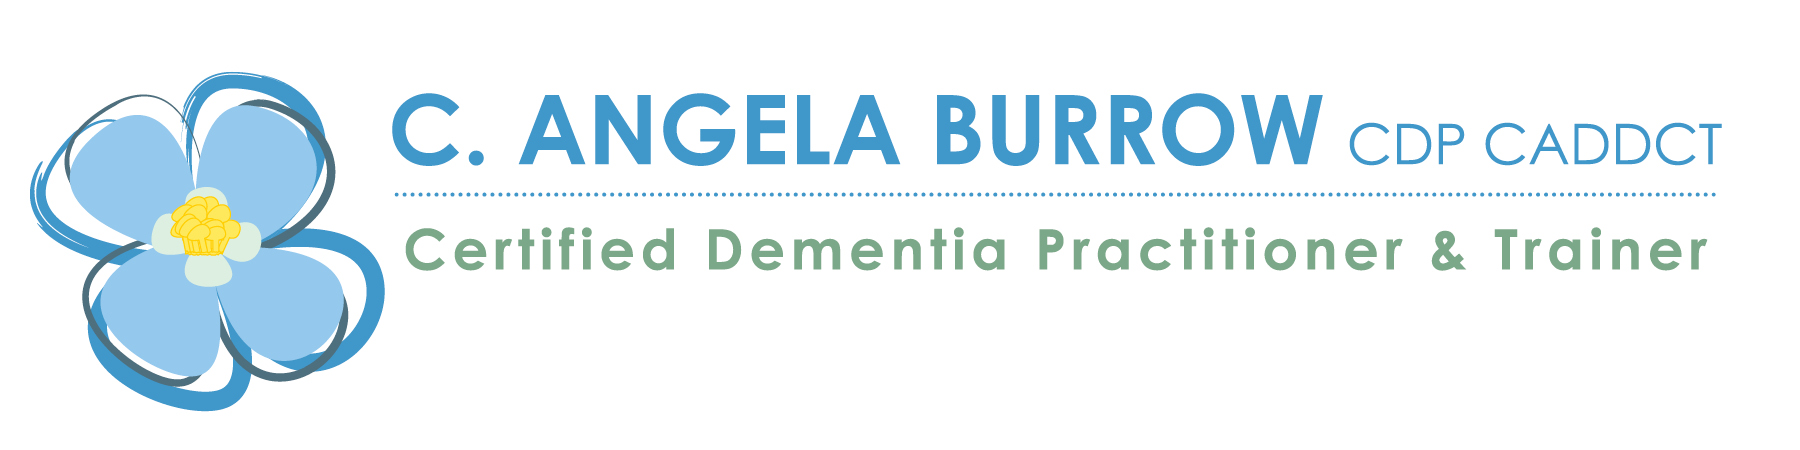 Angela Burrow logo.jpg